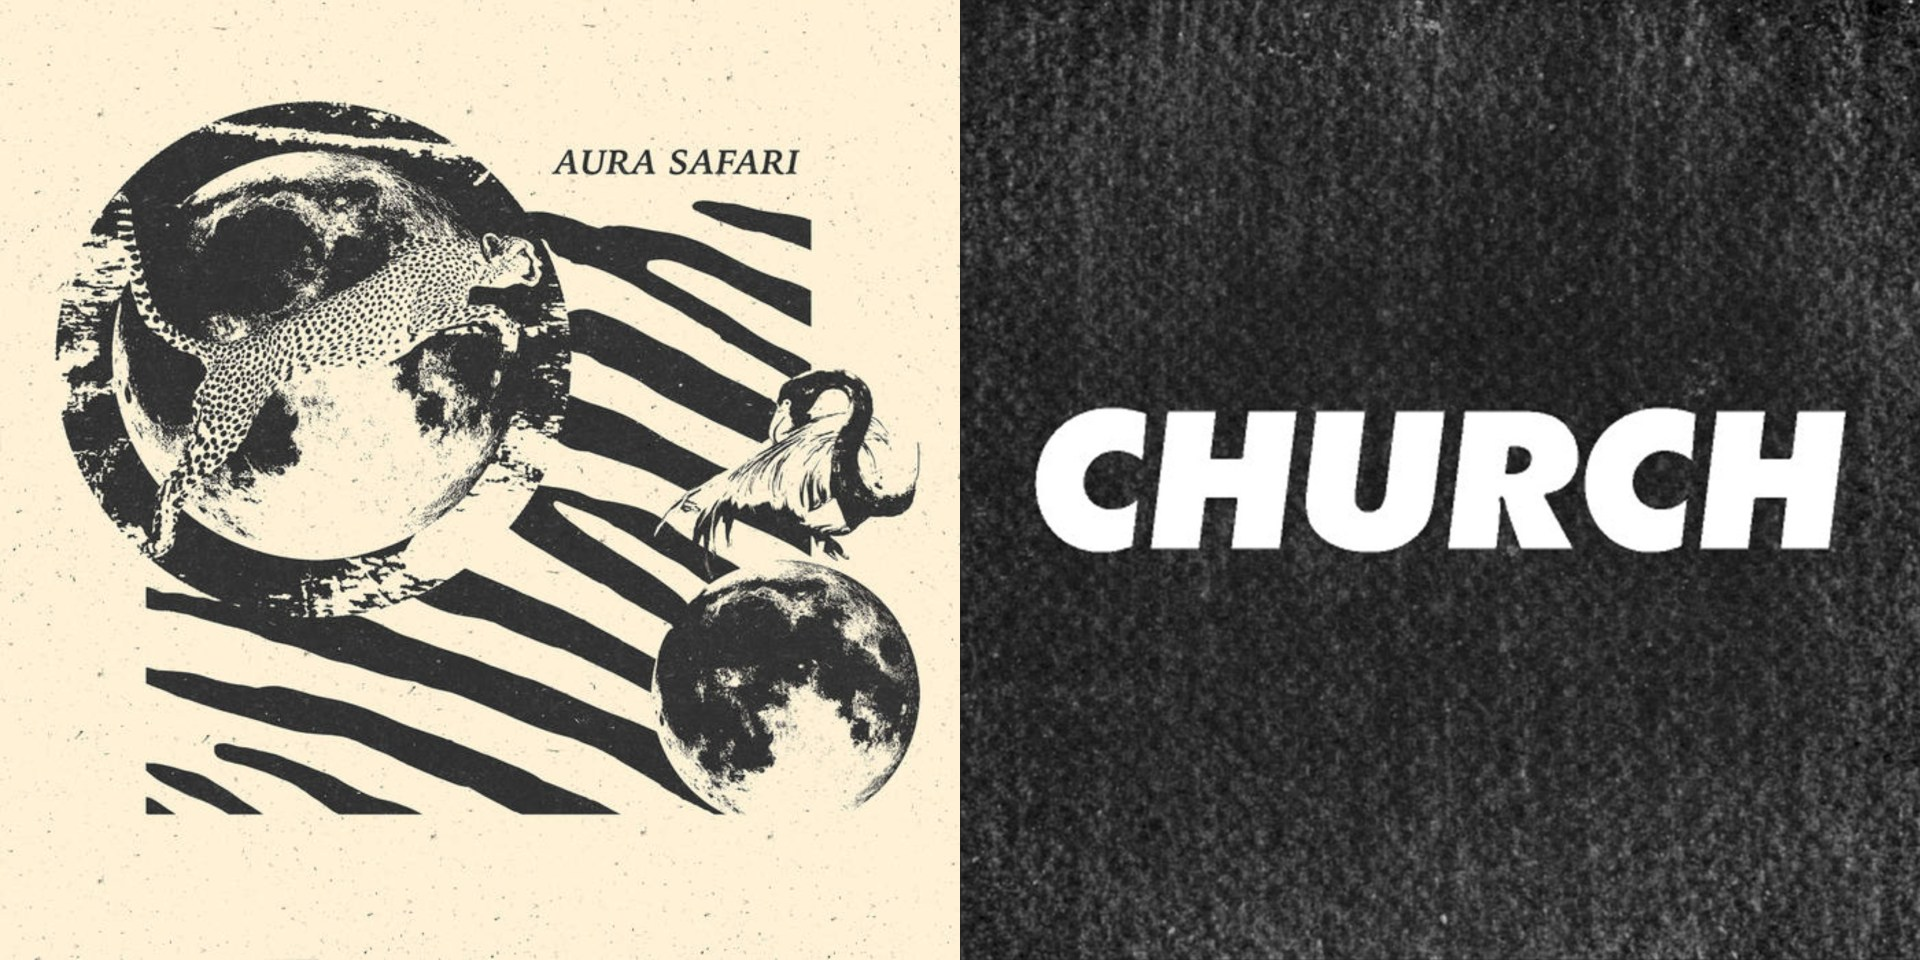 Aura Safari next up on Church.